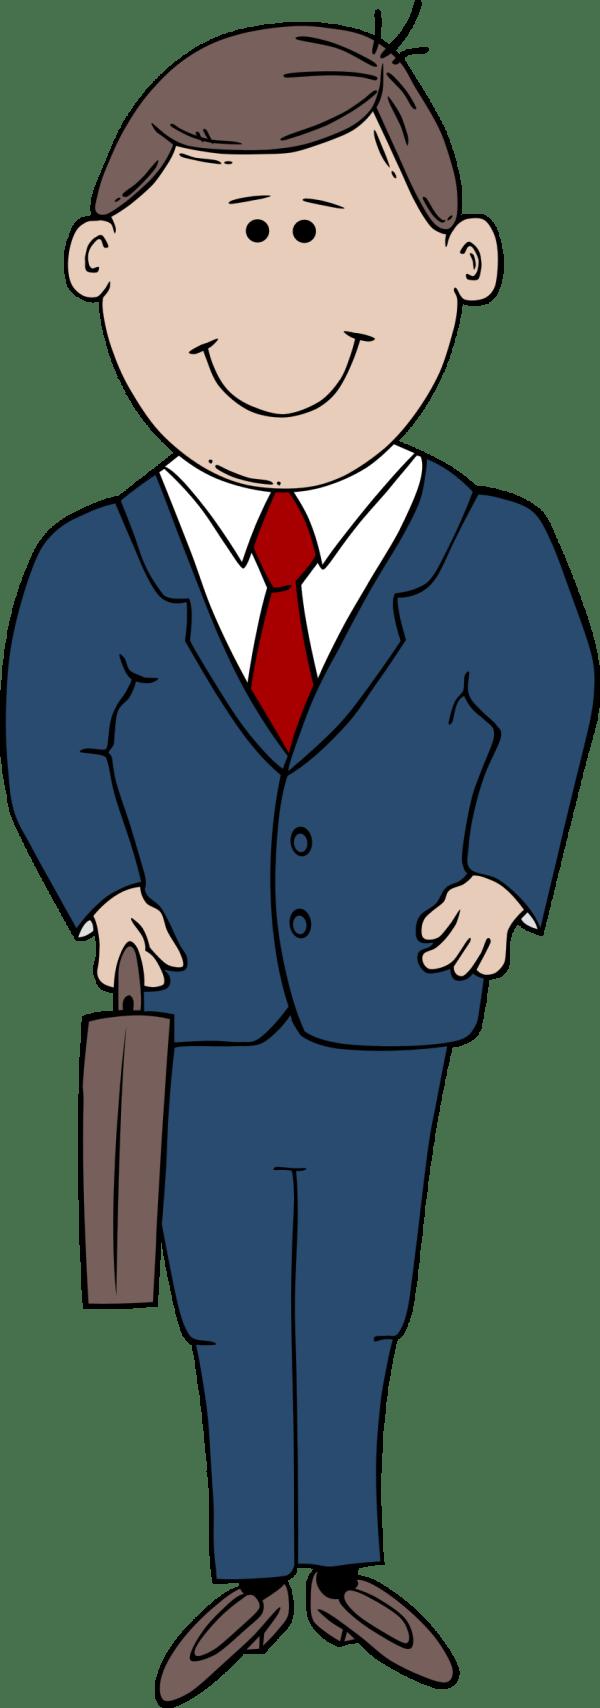 clipart - man in suit